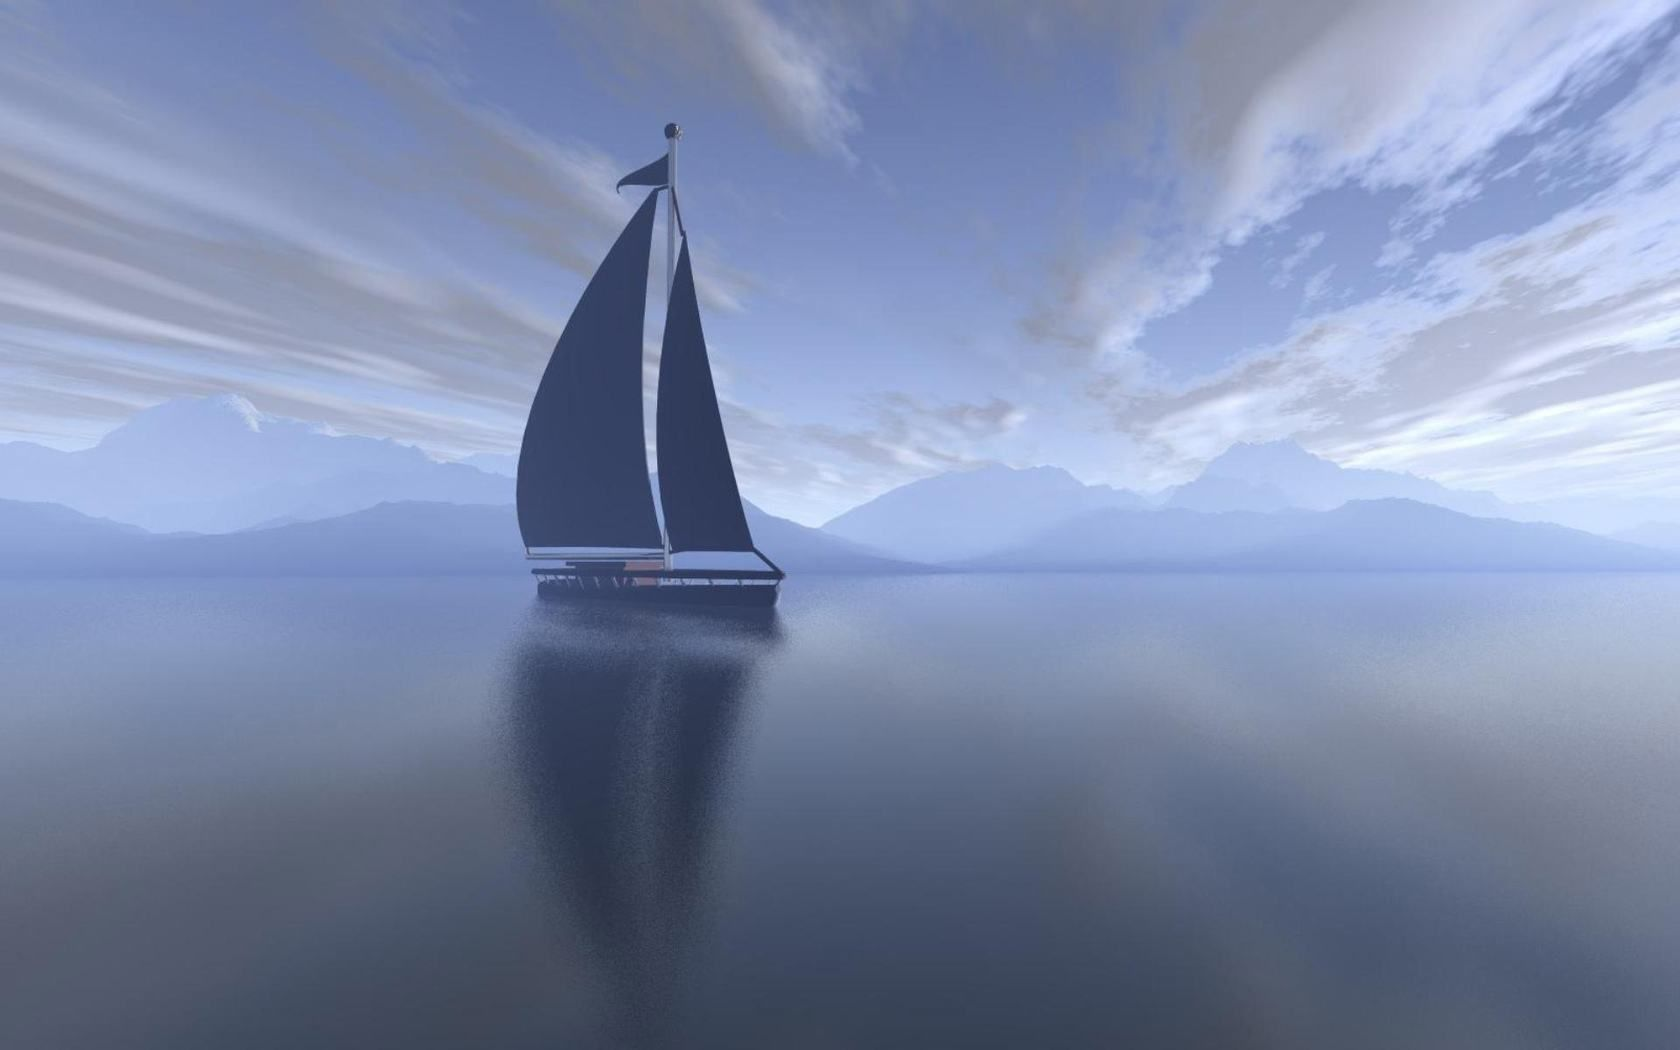 Обои яхта, Пейзаж. Природа foto 10